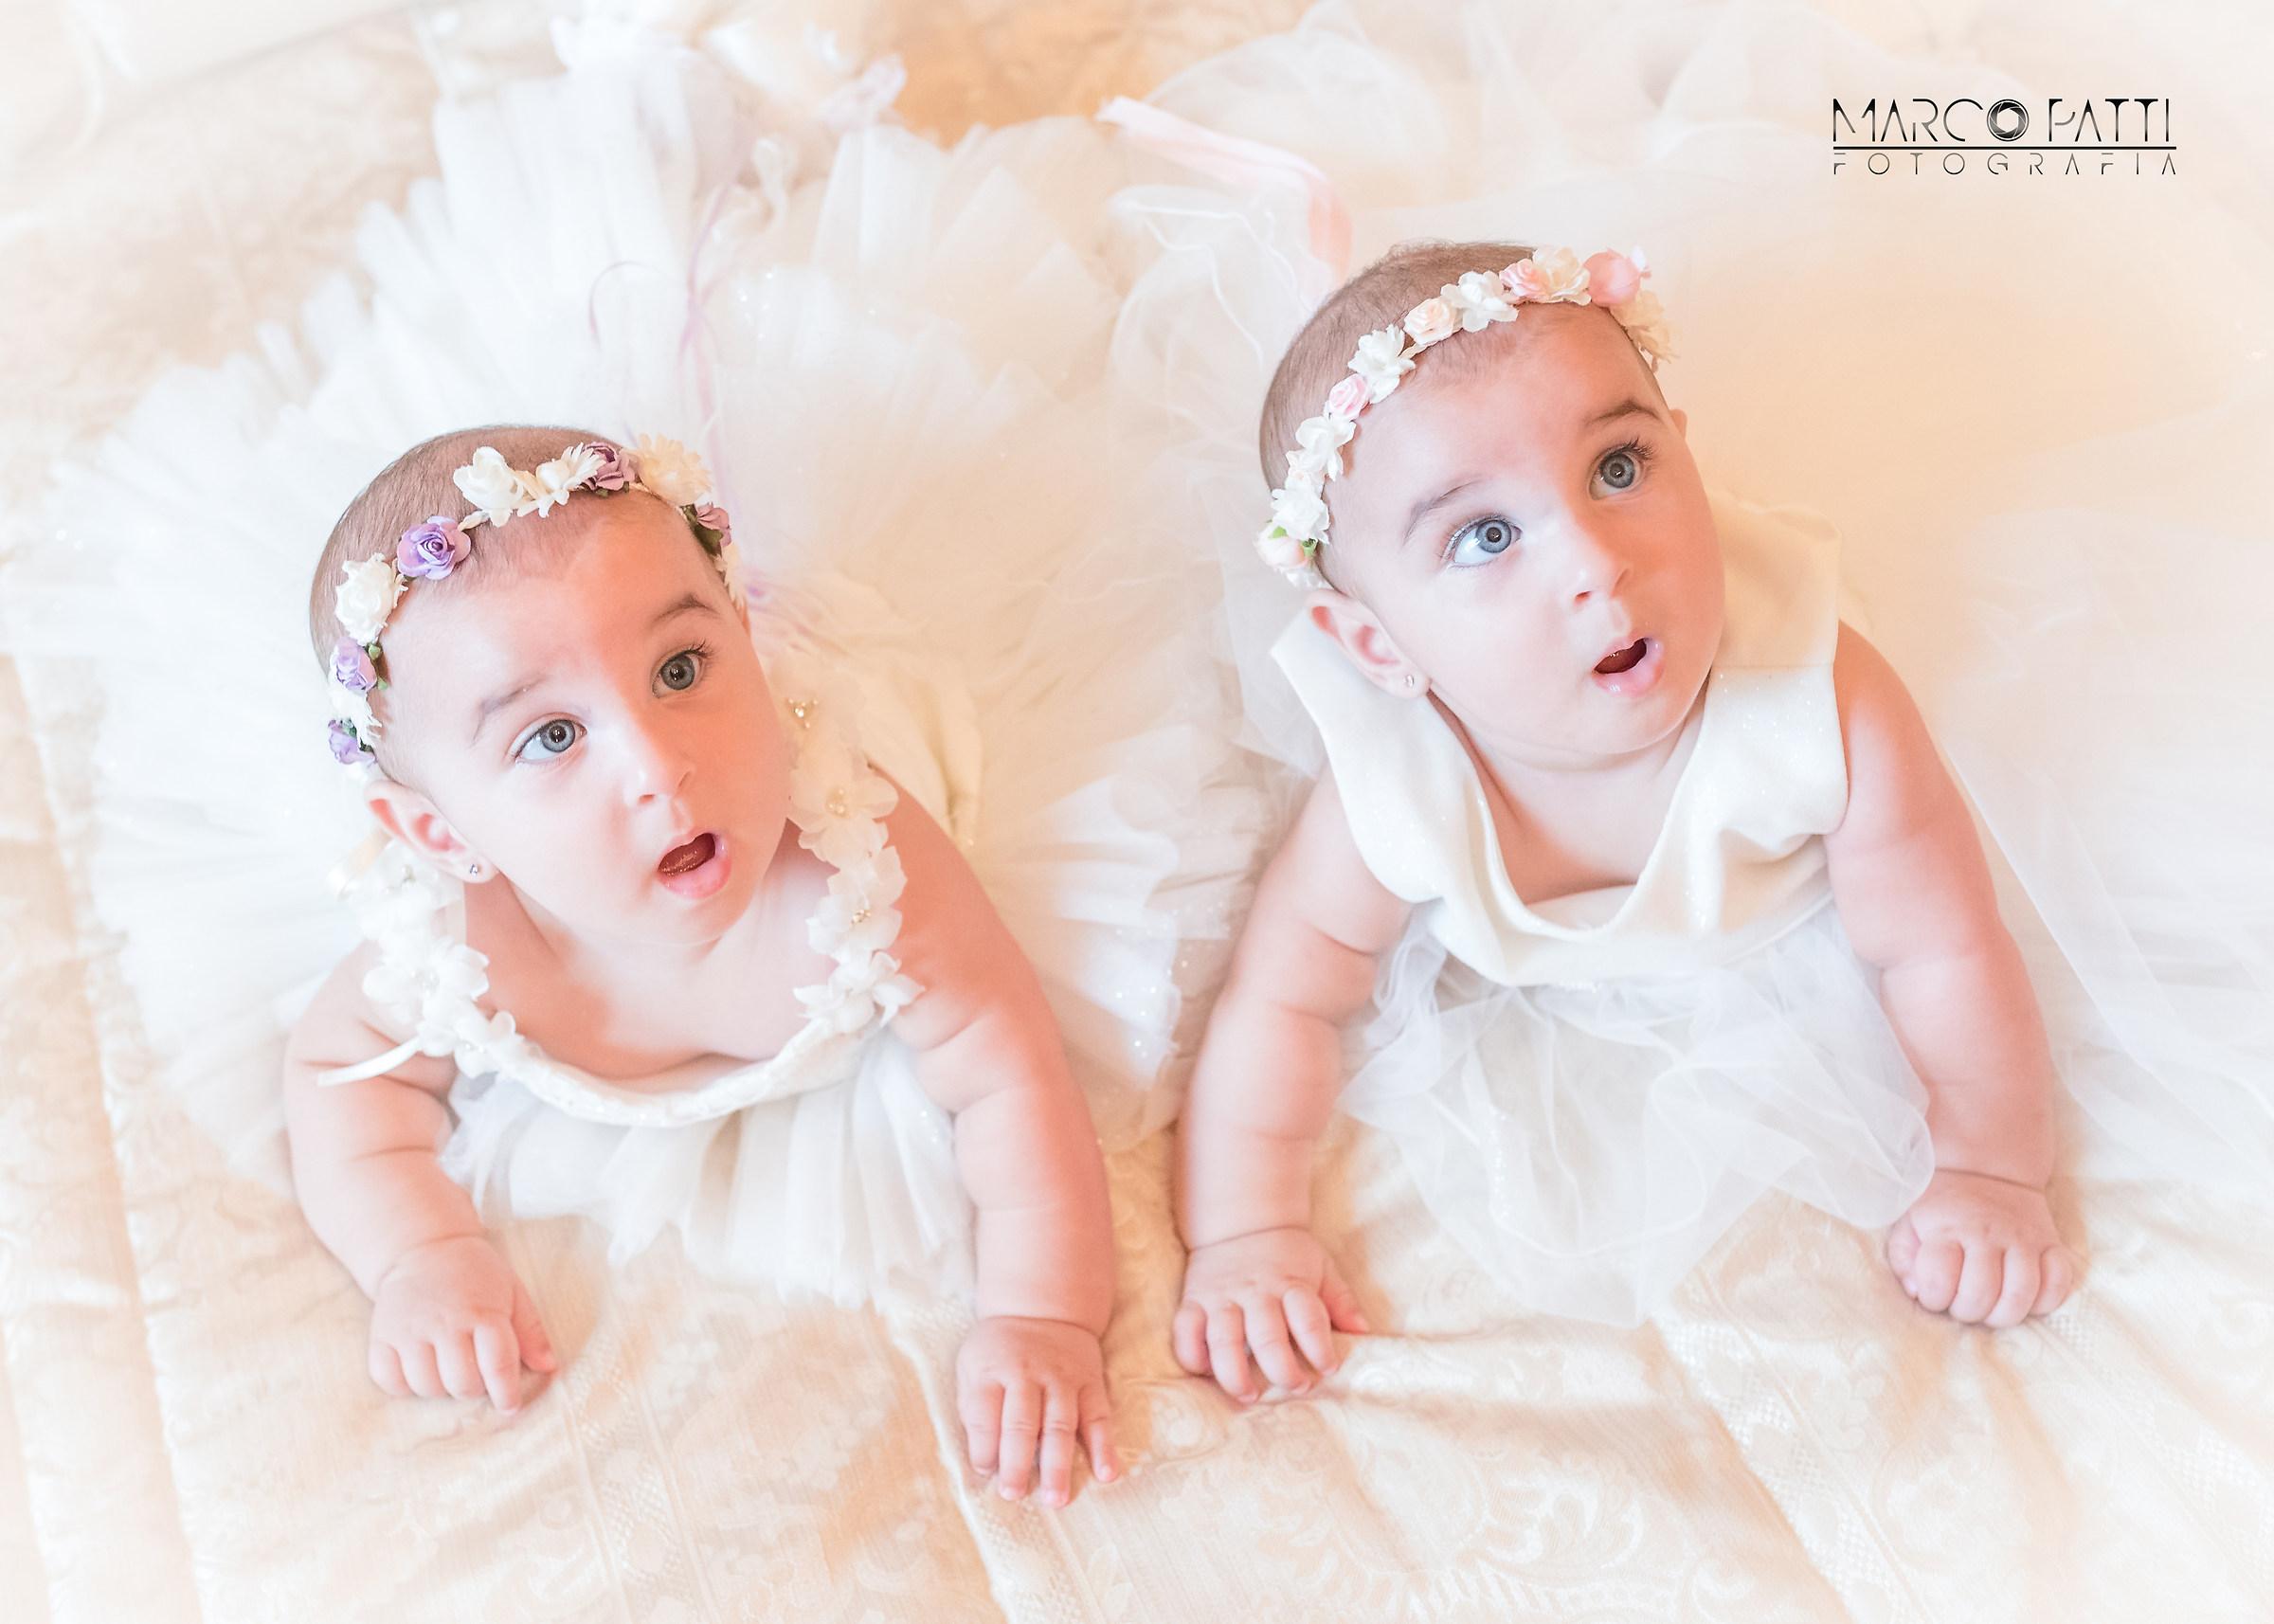 Twins # 3...